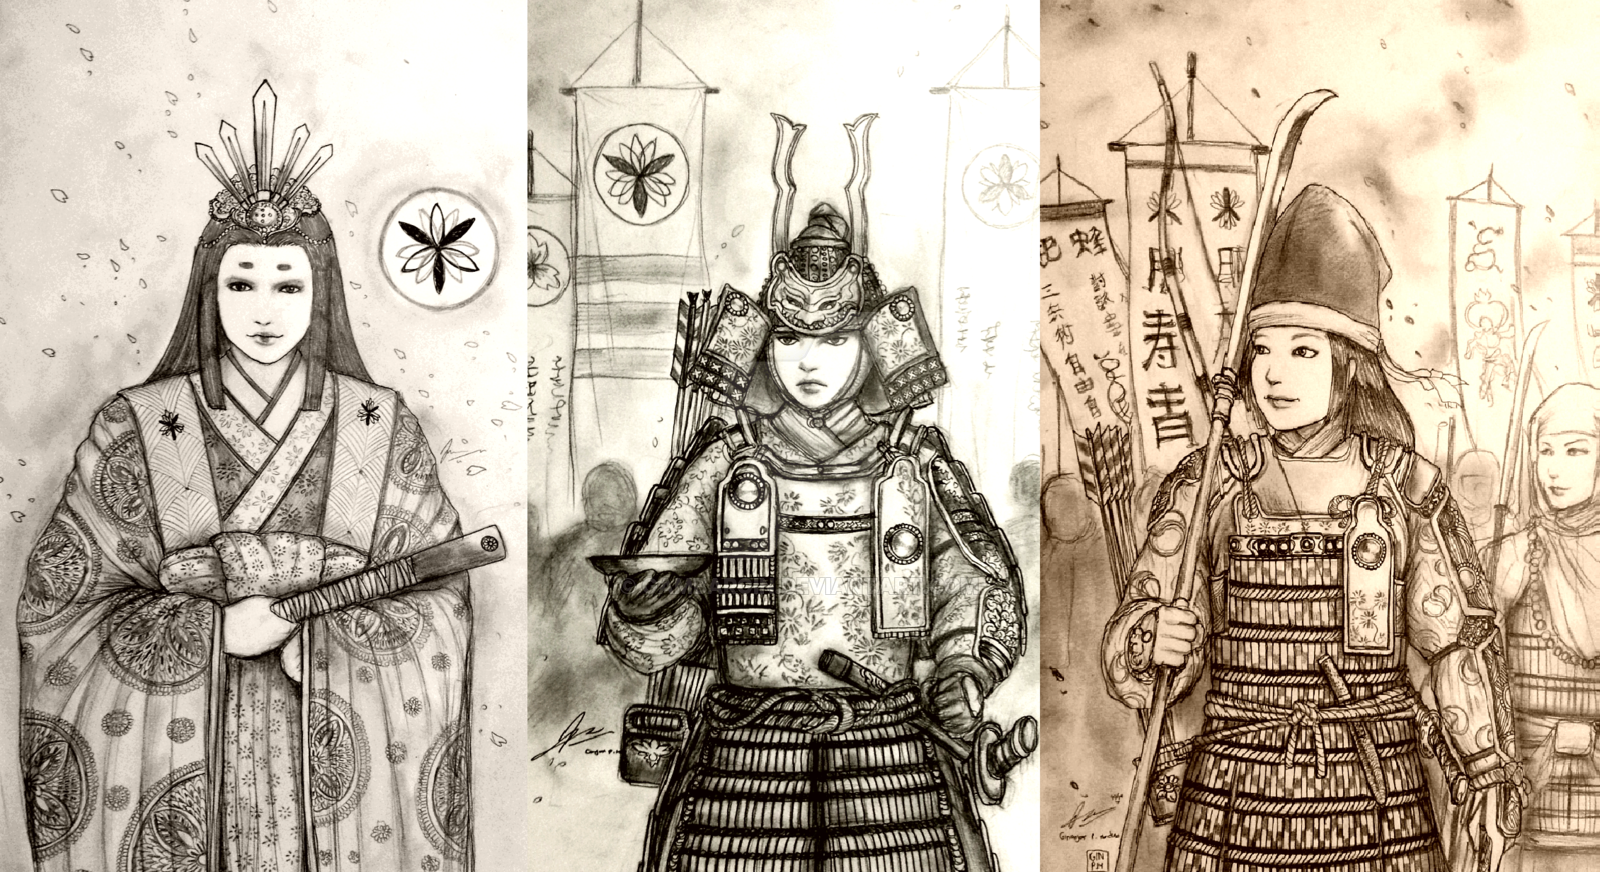 Mulheres samurais